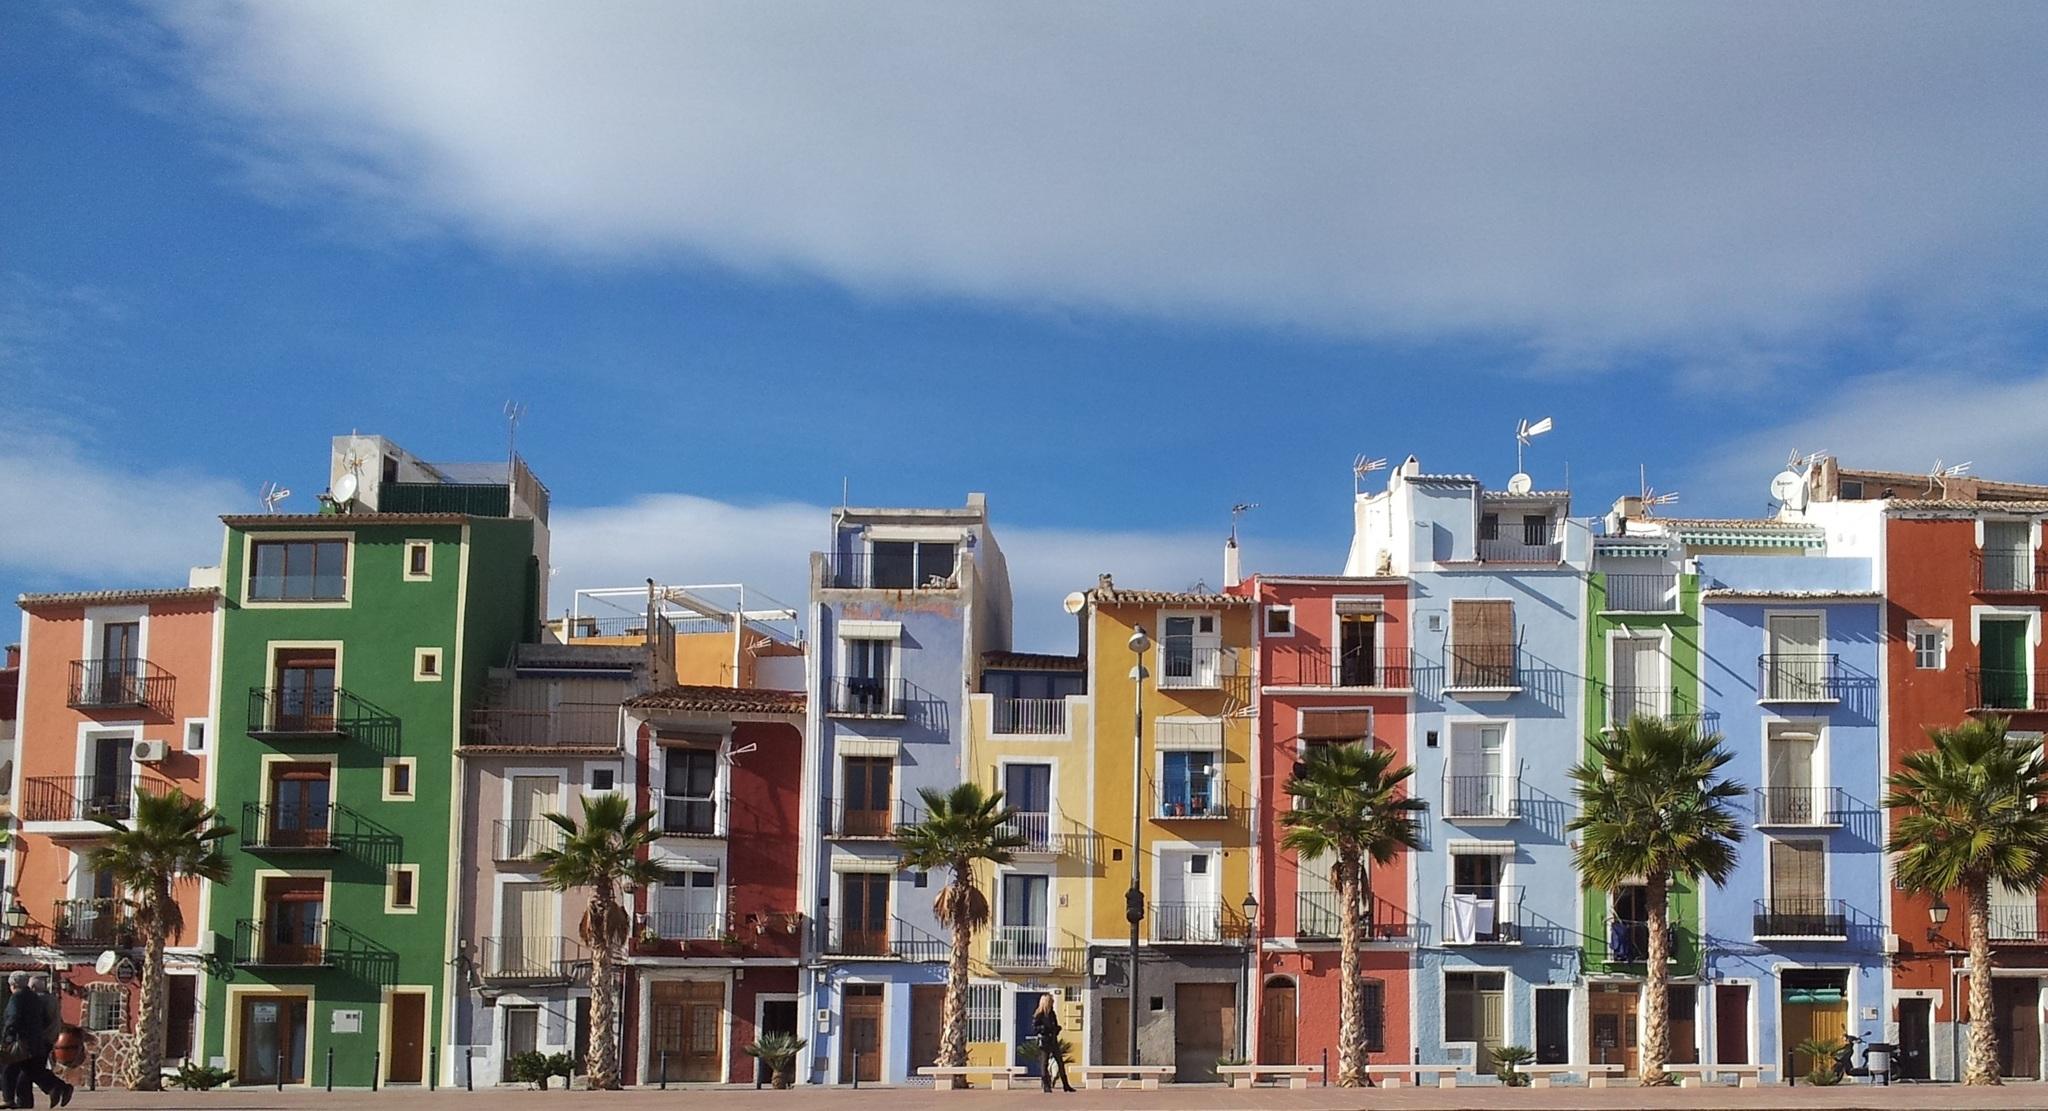 Viviendas en Villajoyosa, Alicante.